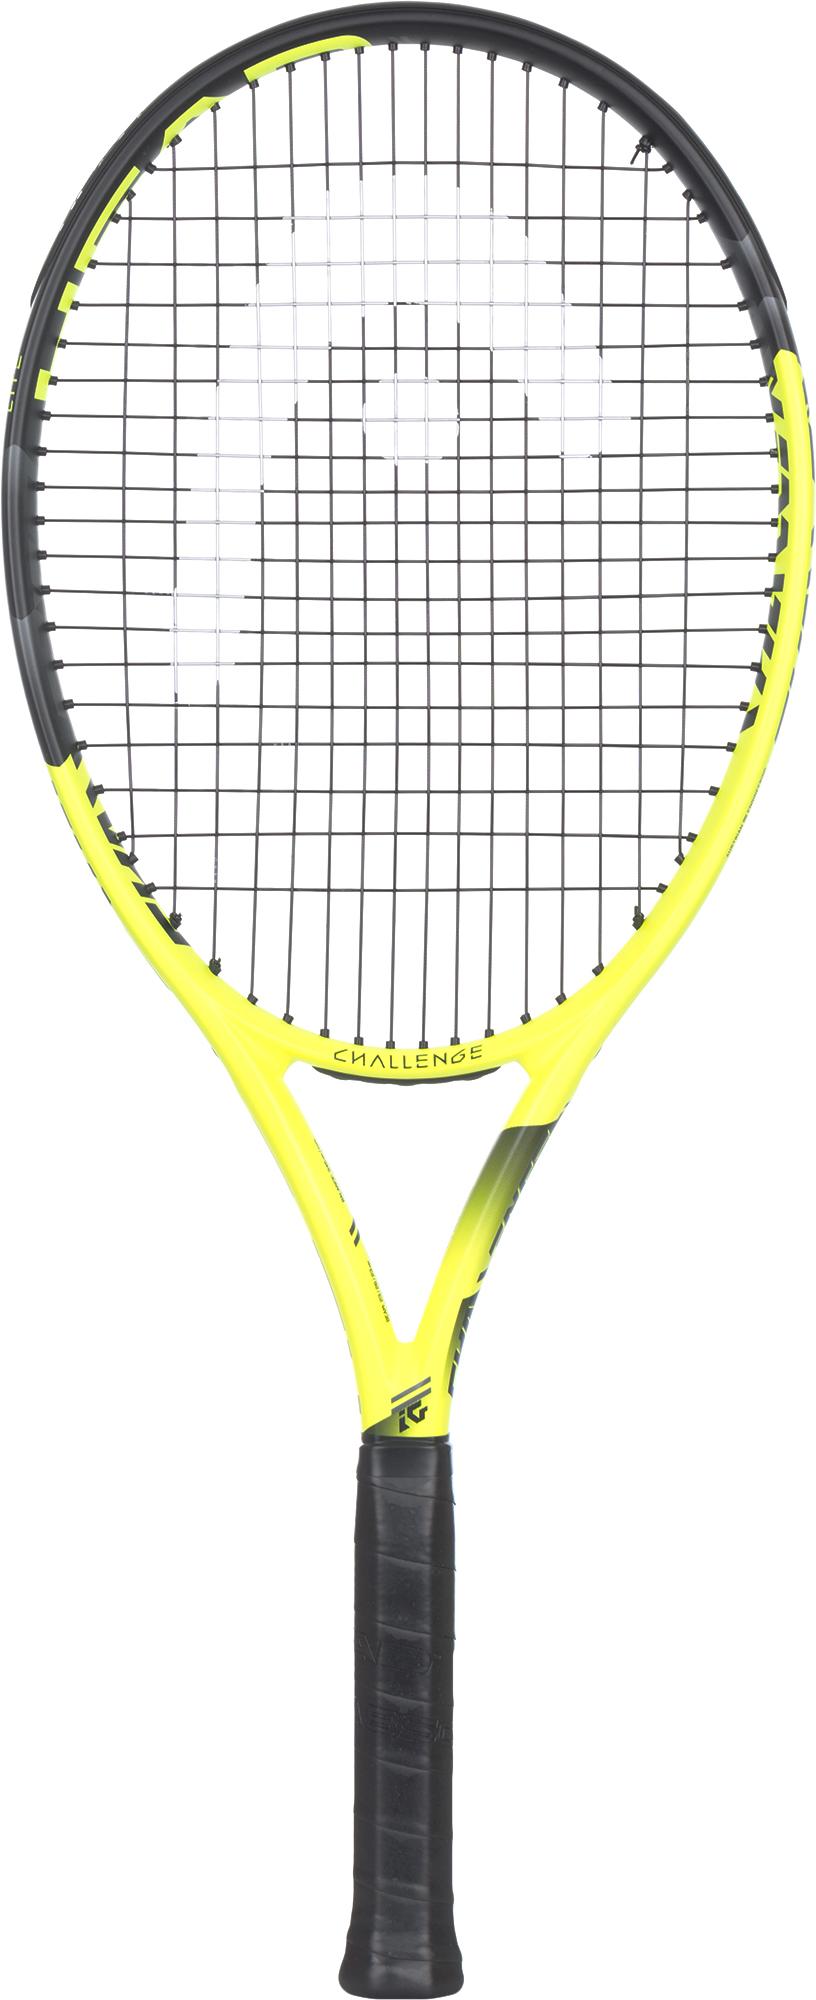 Head Ракетка для большого тенниса Head IG Challenge Lite head ракетка для большого тенниса head graphene 360 speed lite 27